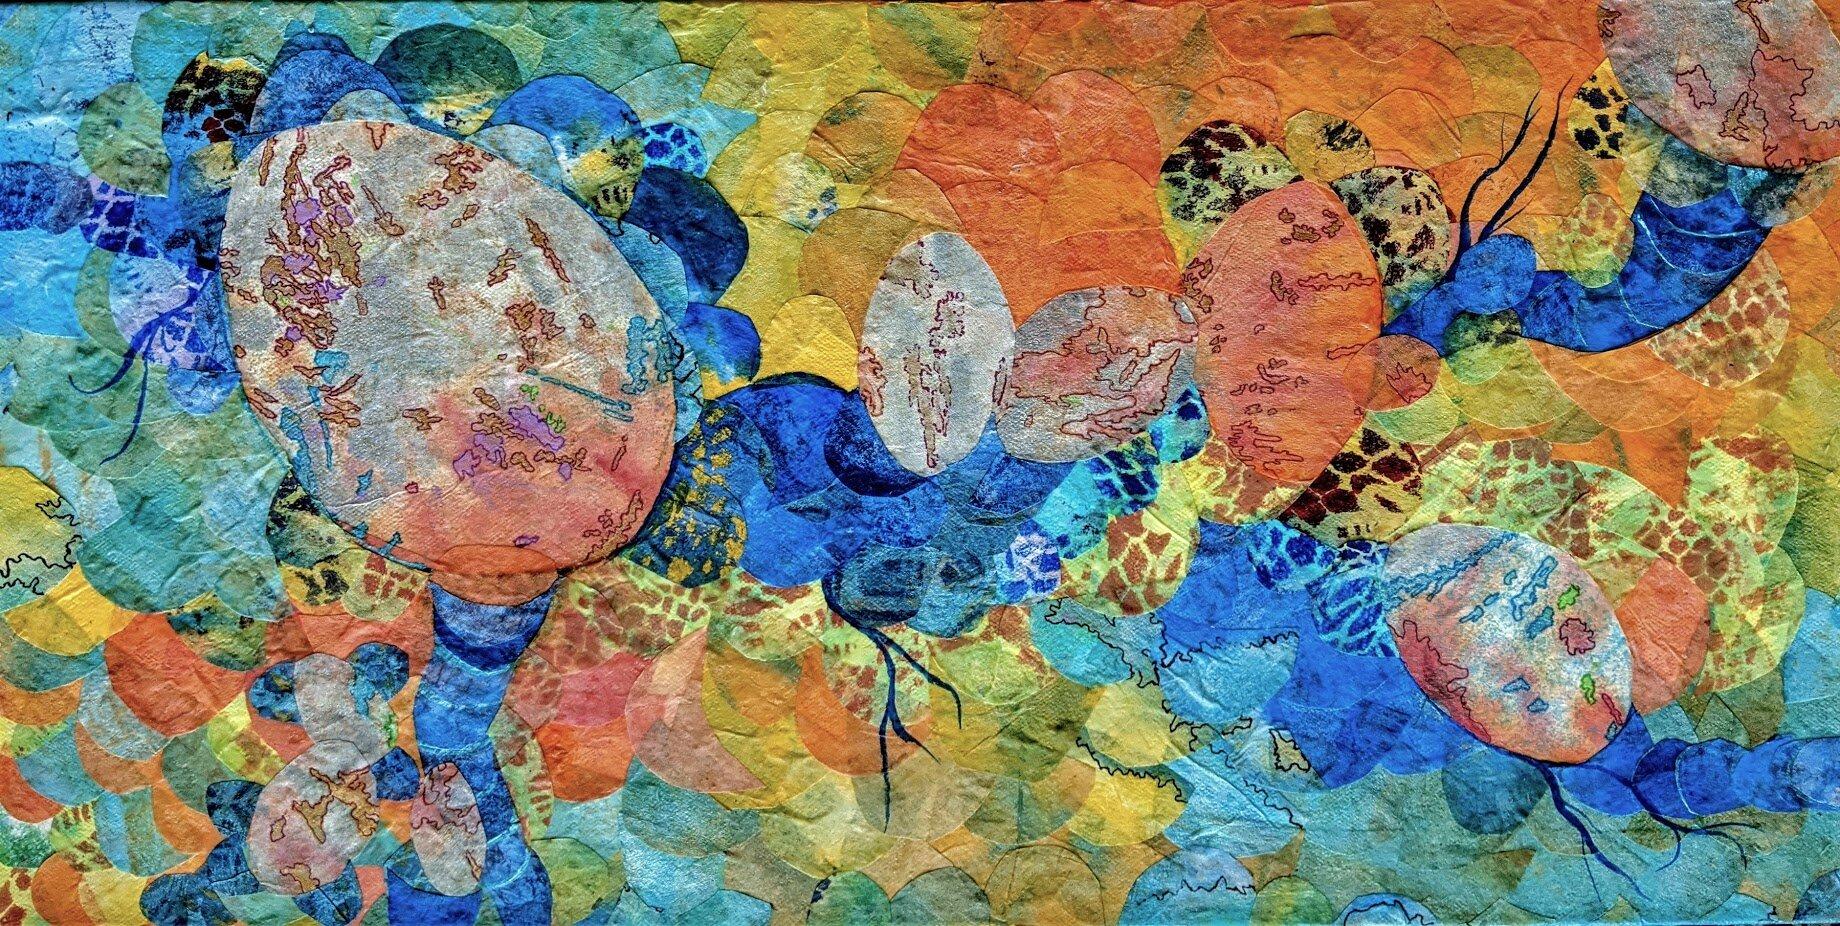 Bird 01 Emmons, Jeanne (born 1954) - Cosmogenesis (2010)